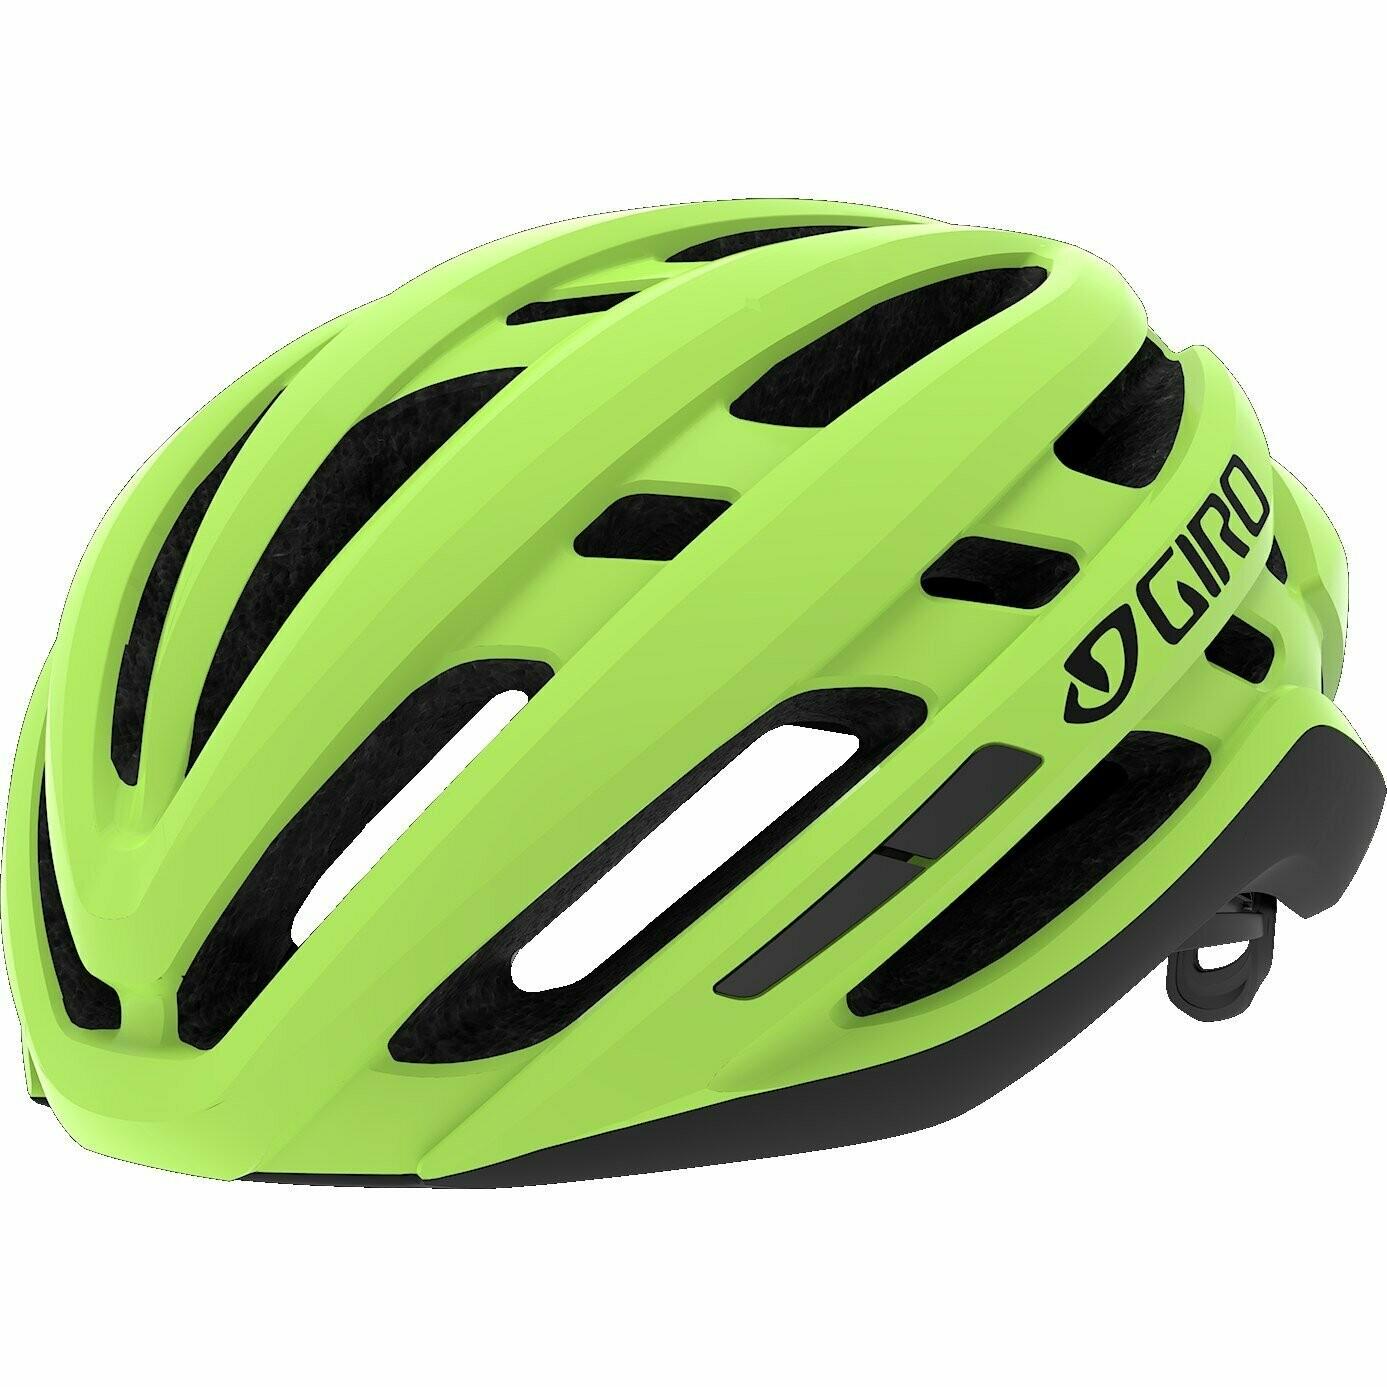 Giro Agilis Helmet- Highlight Yellow